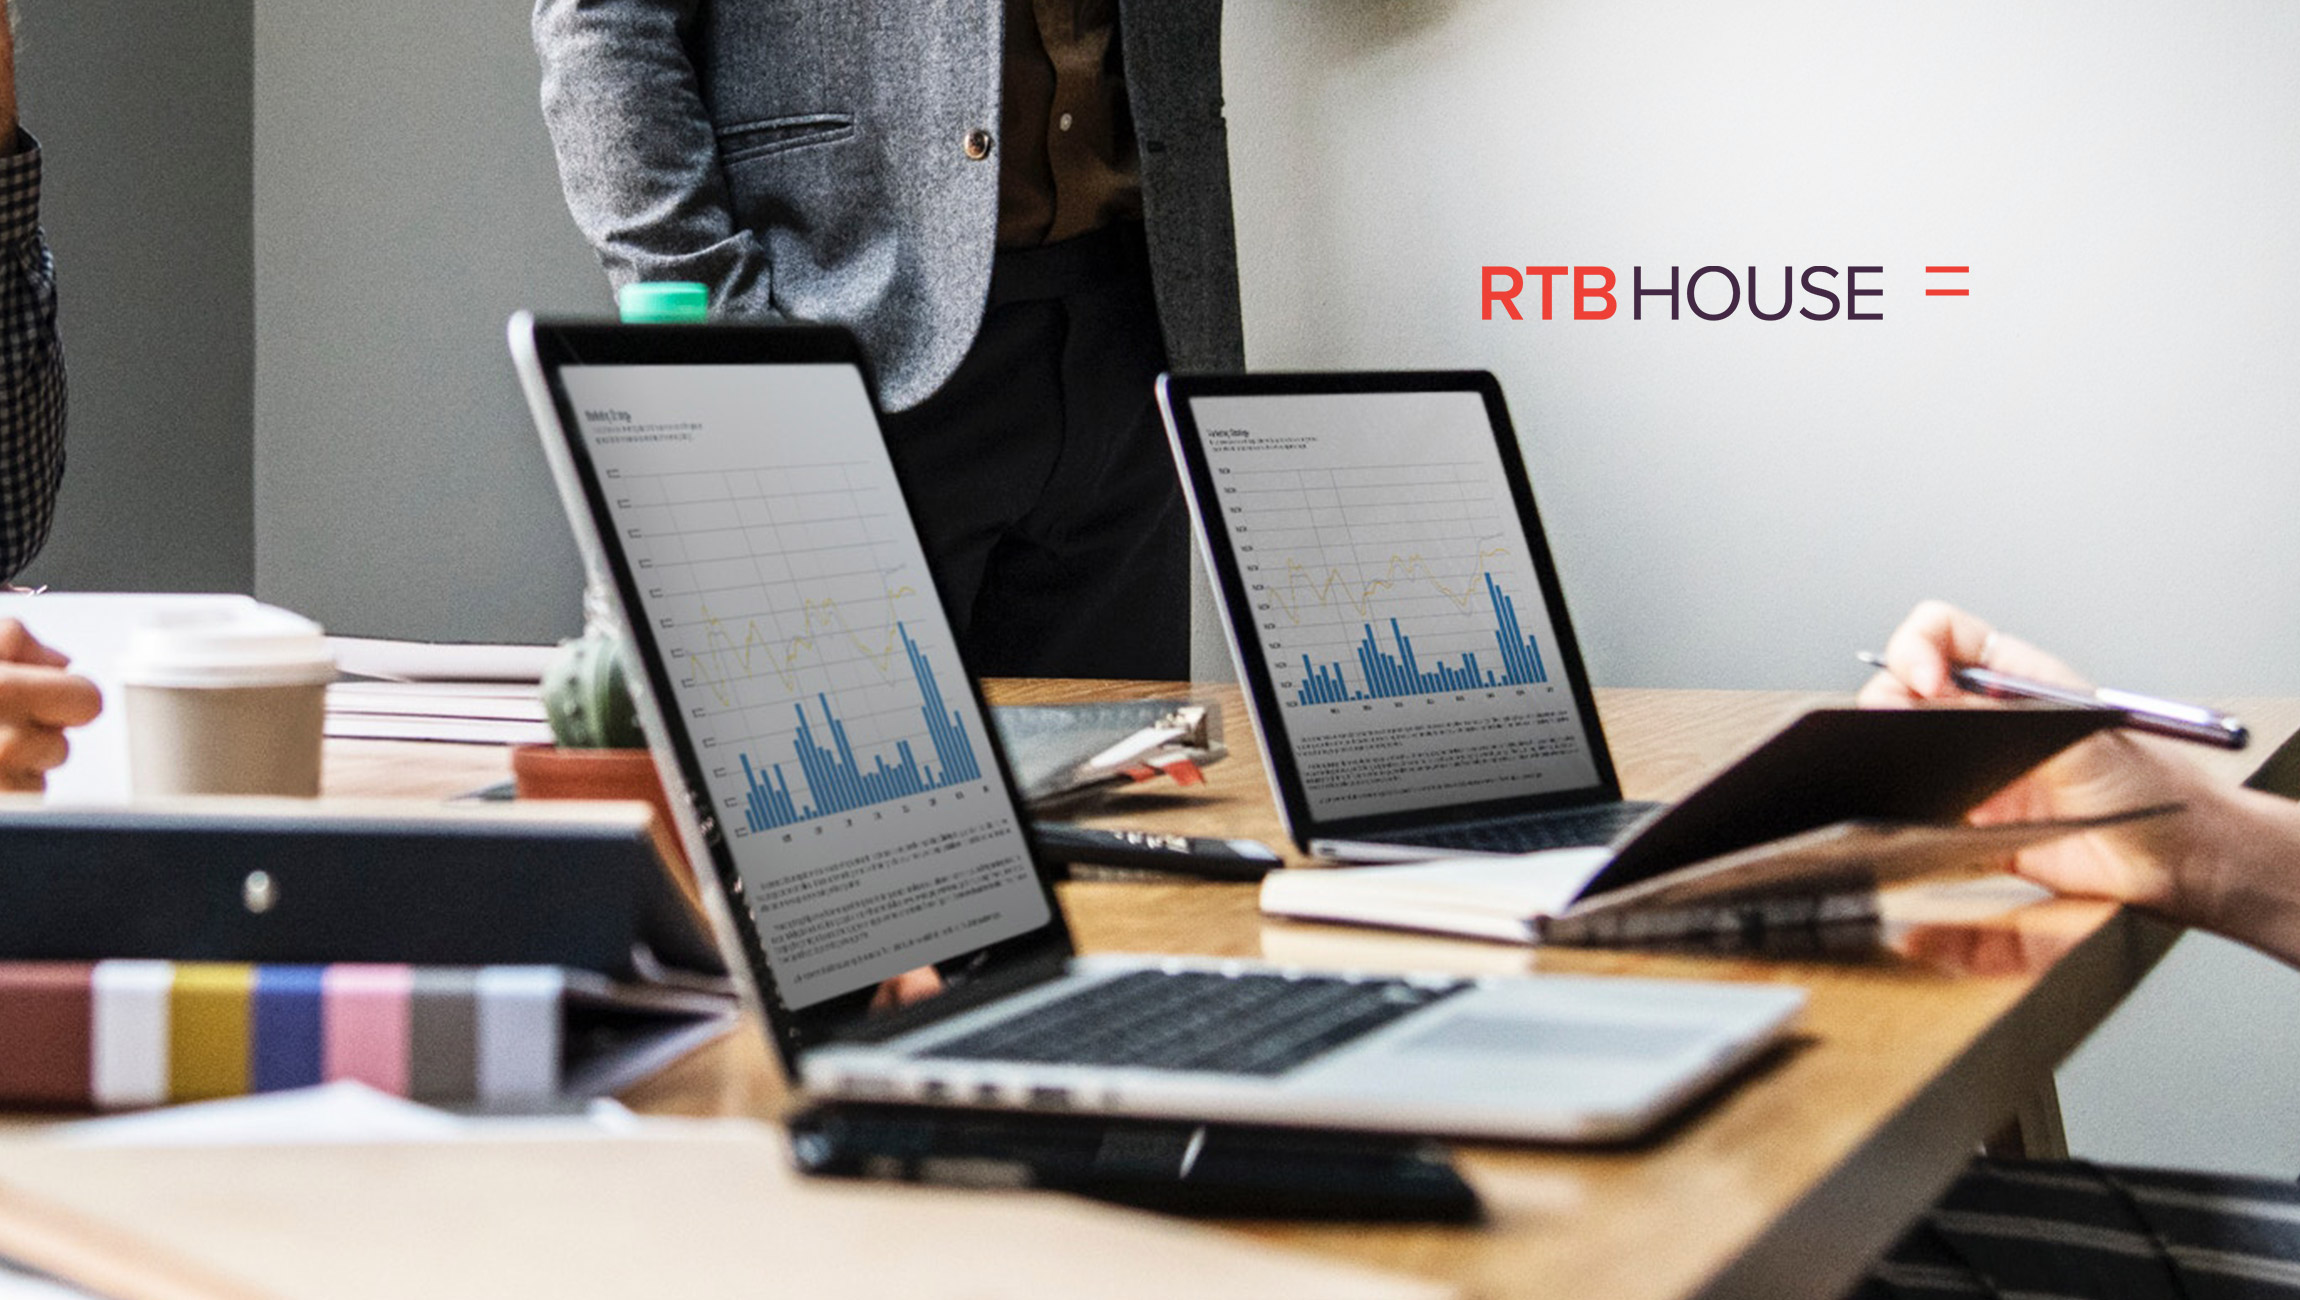 rtb house